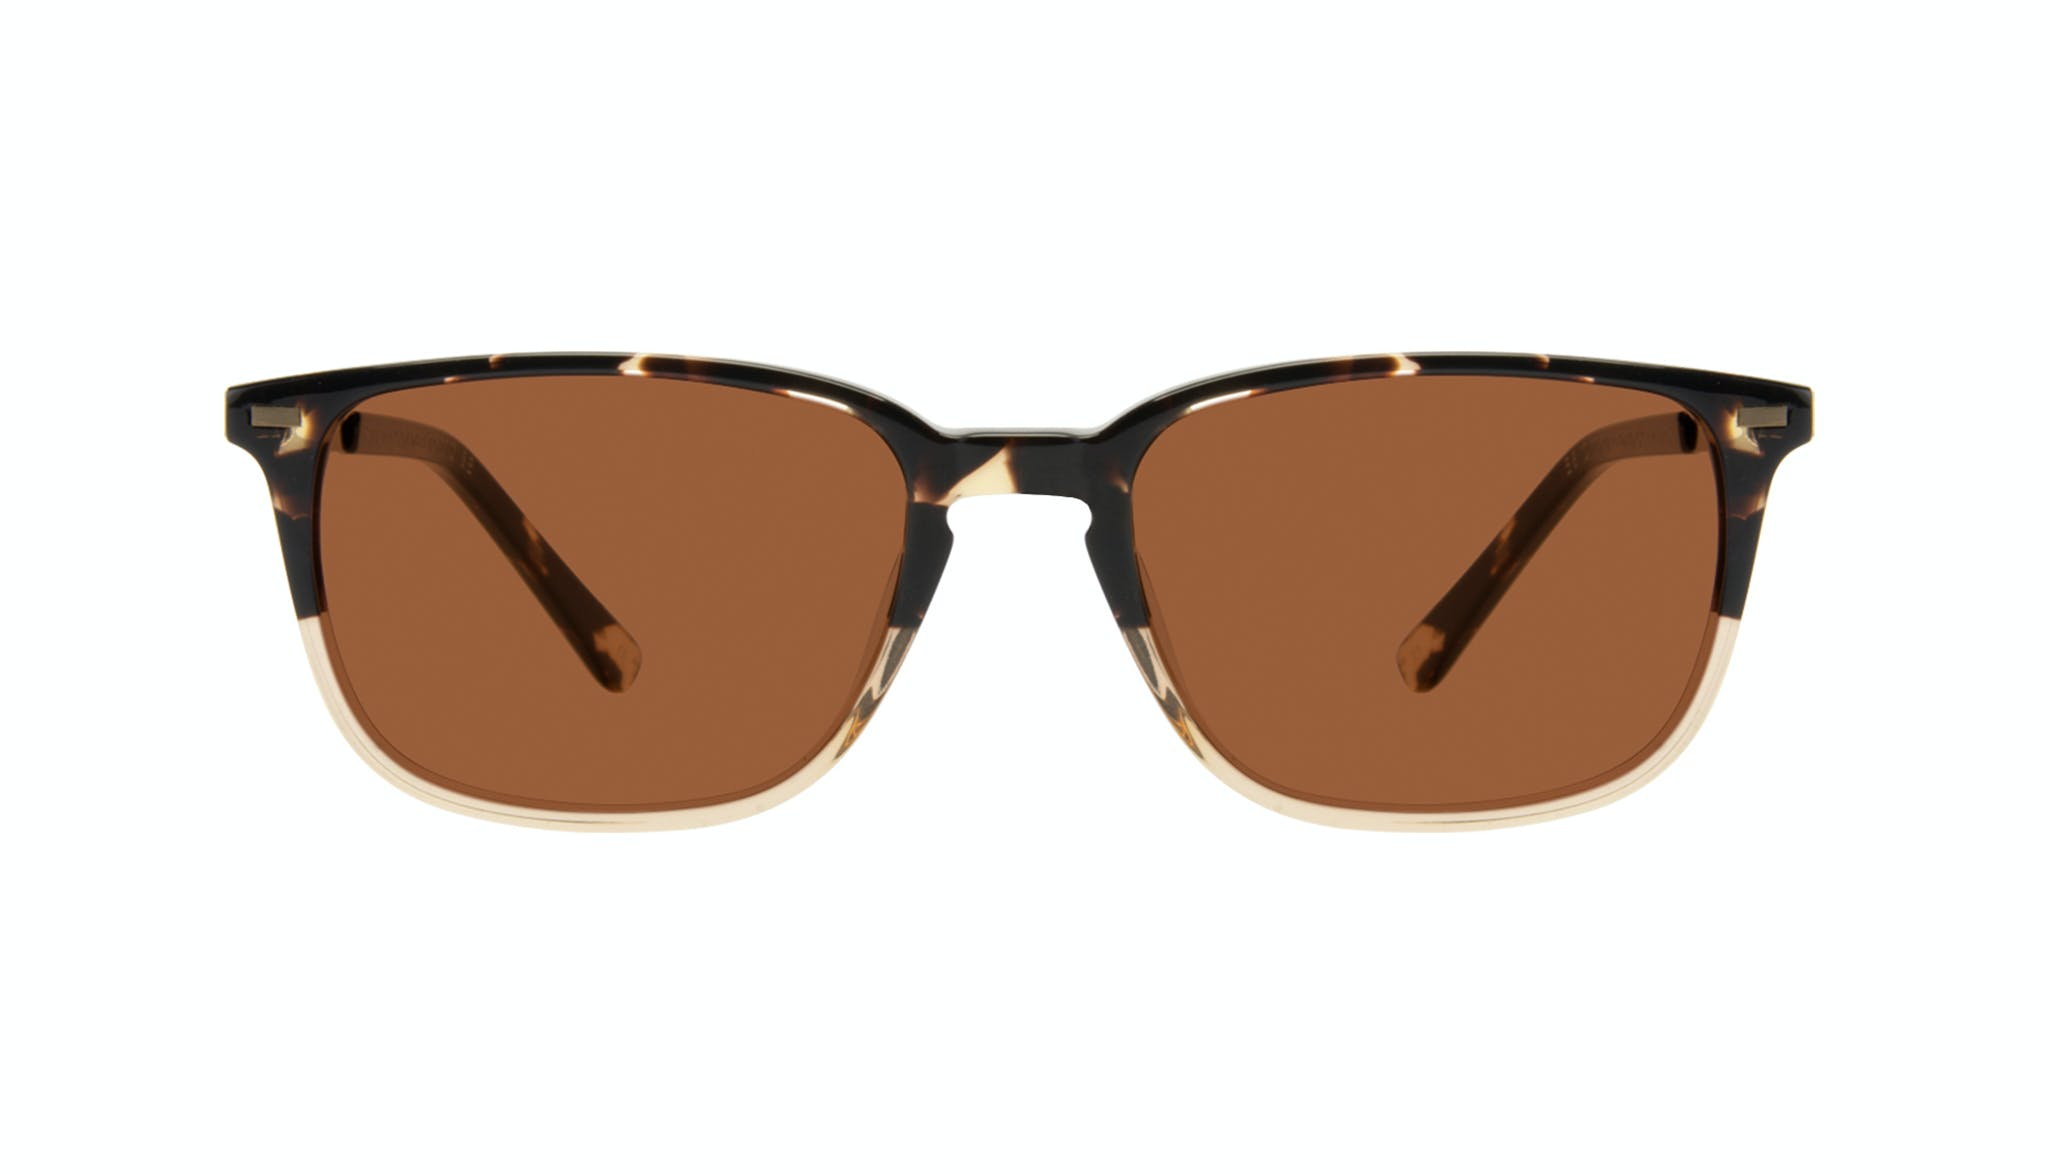 Affordable Fashion Glasses Rectangle Sunglasses Men Sharp Golden Tortoise